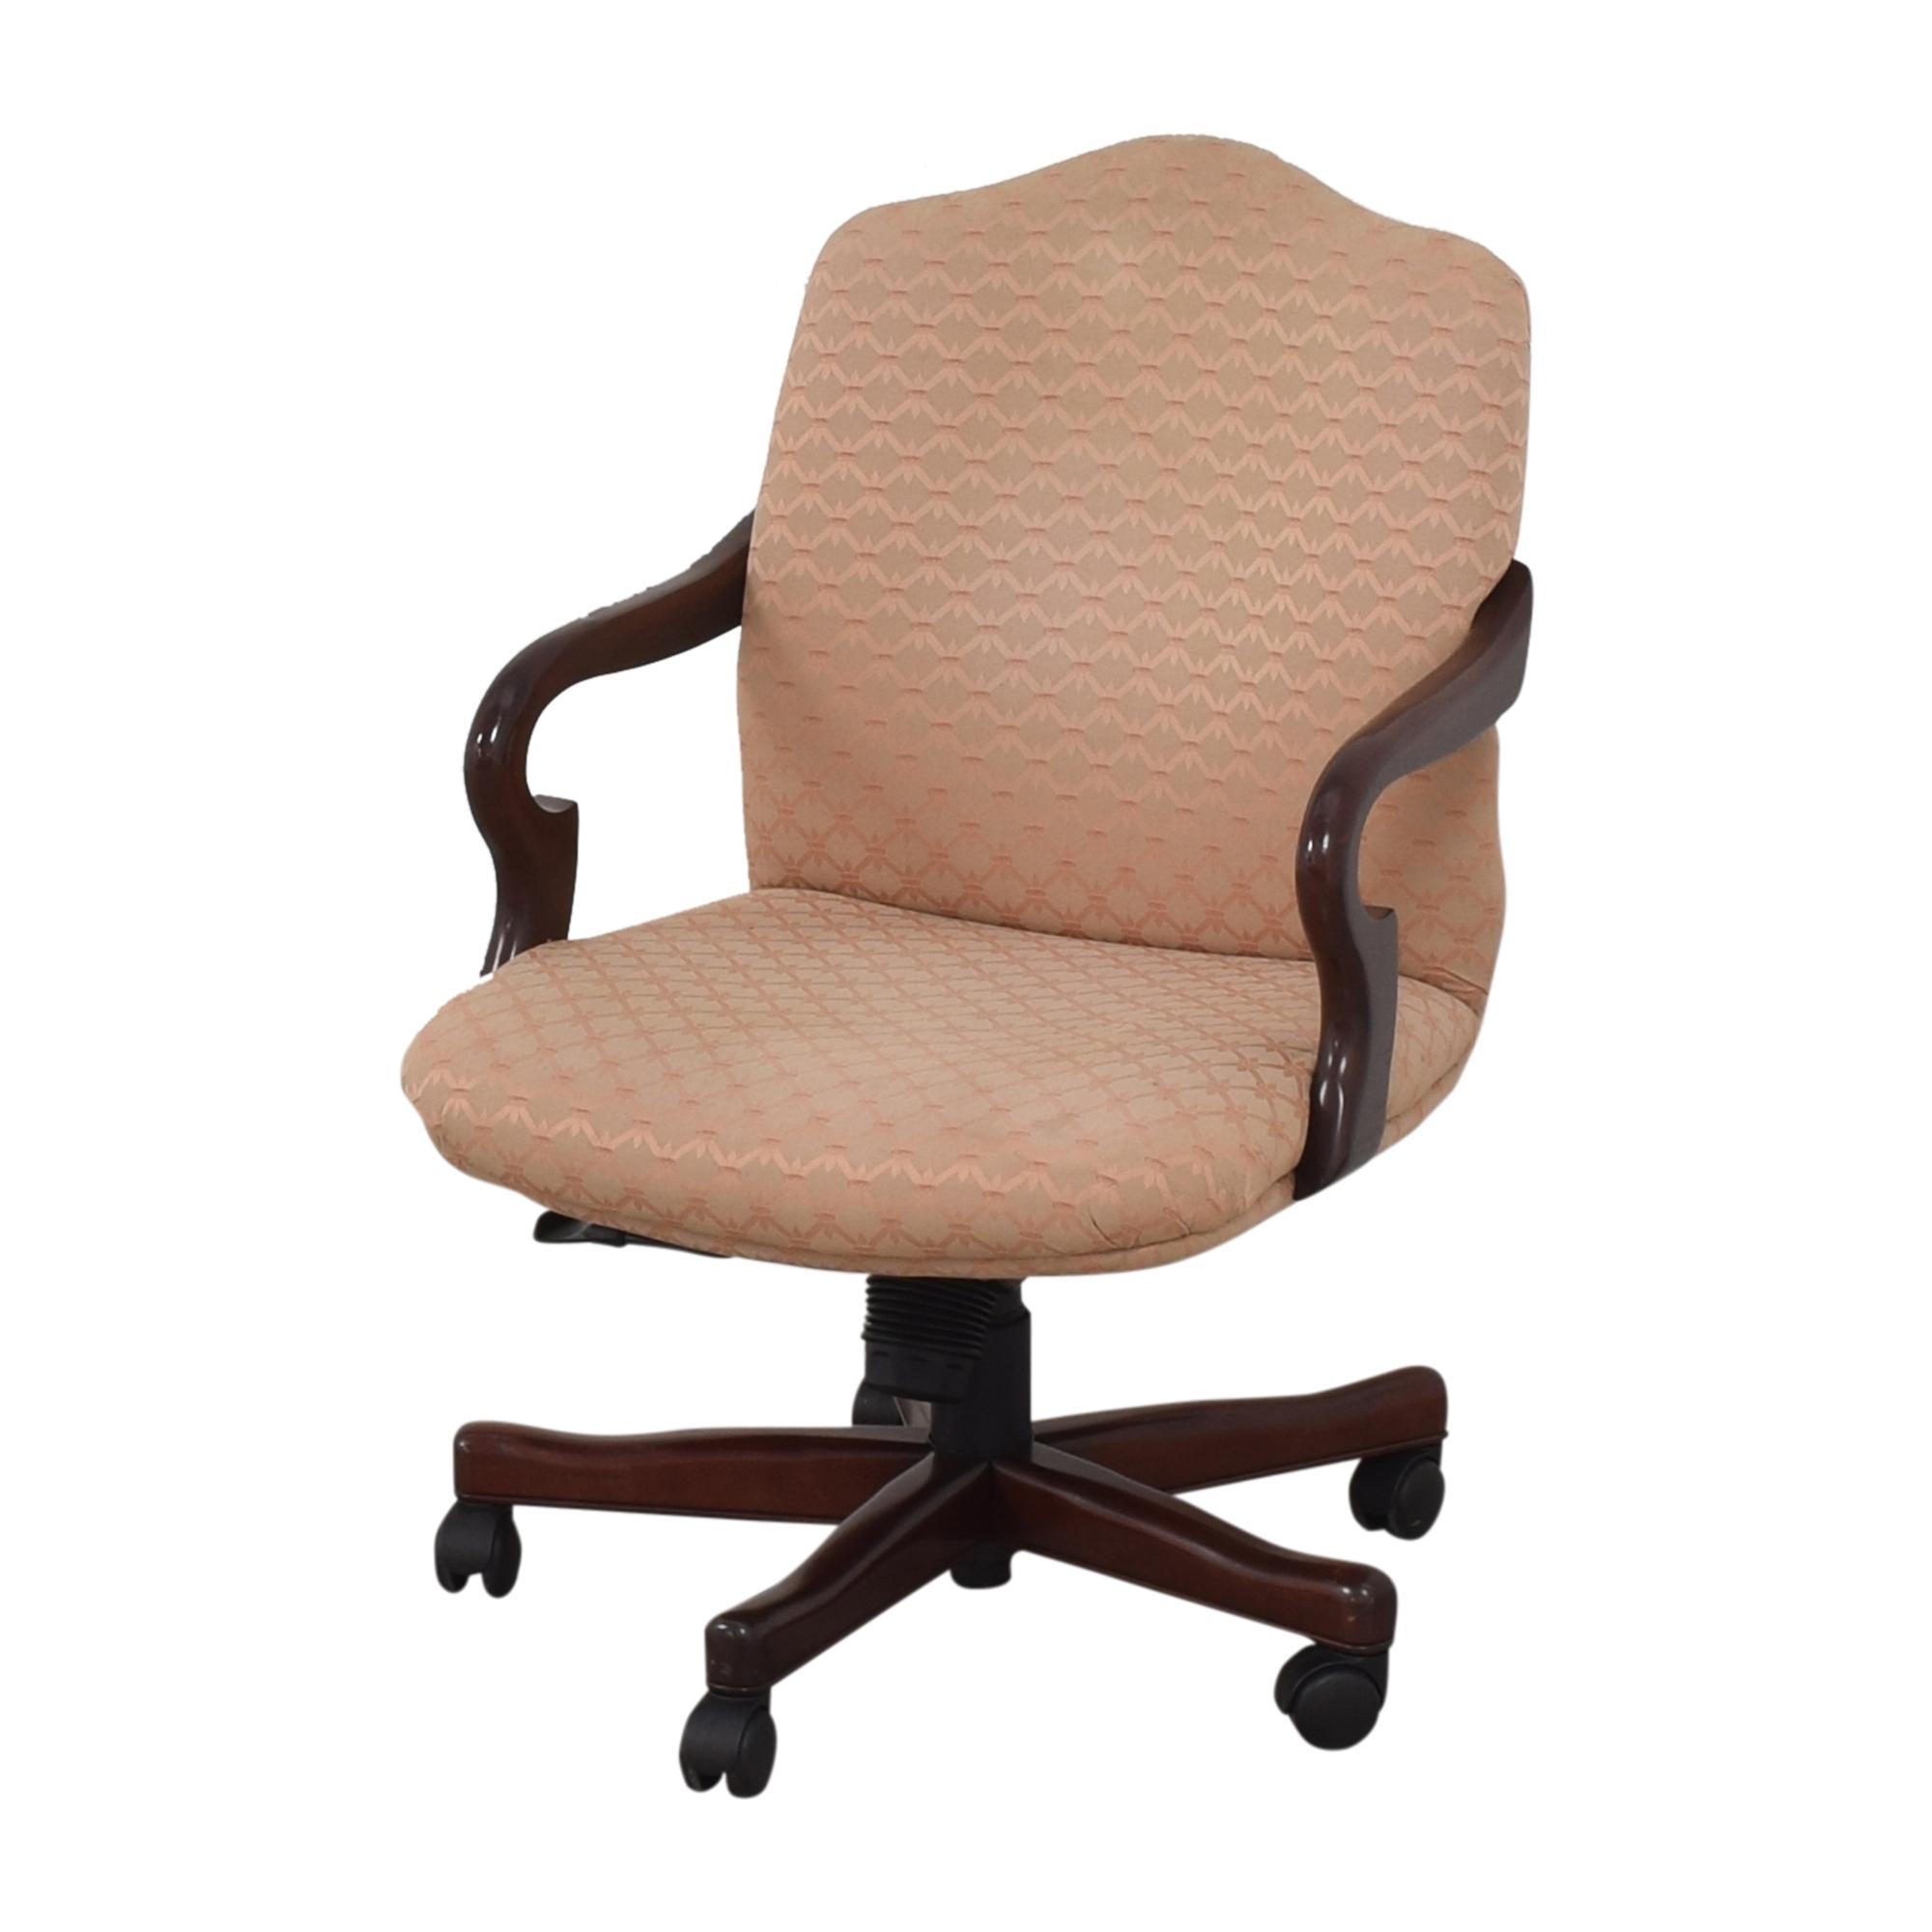 shop Jofco Swivel Tilt Office Chair Jofco Home Office Chairs